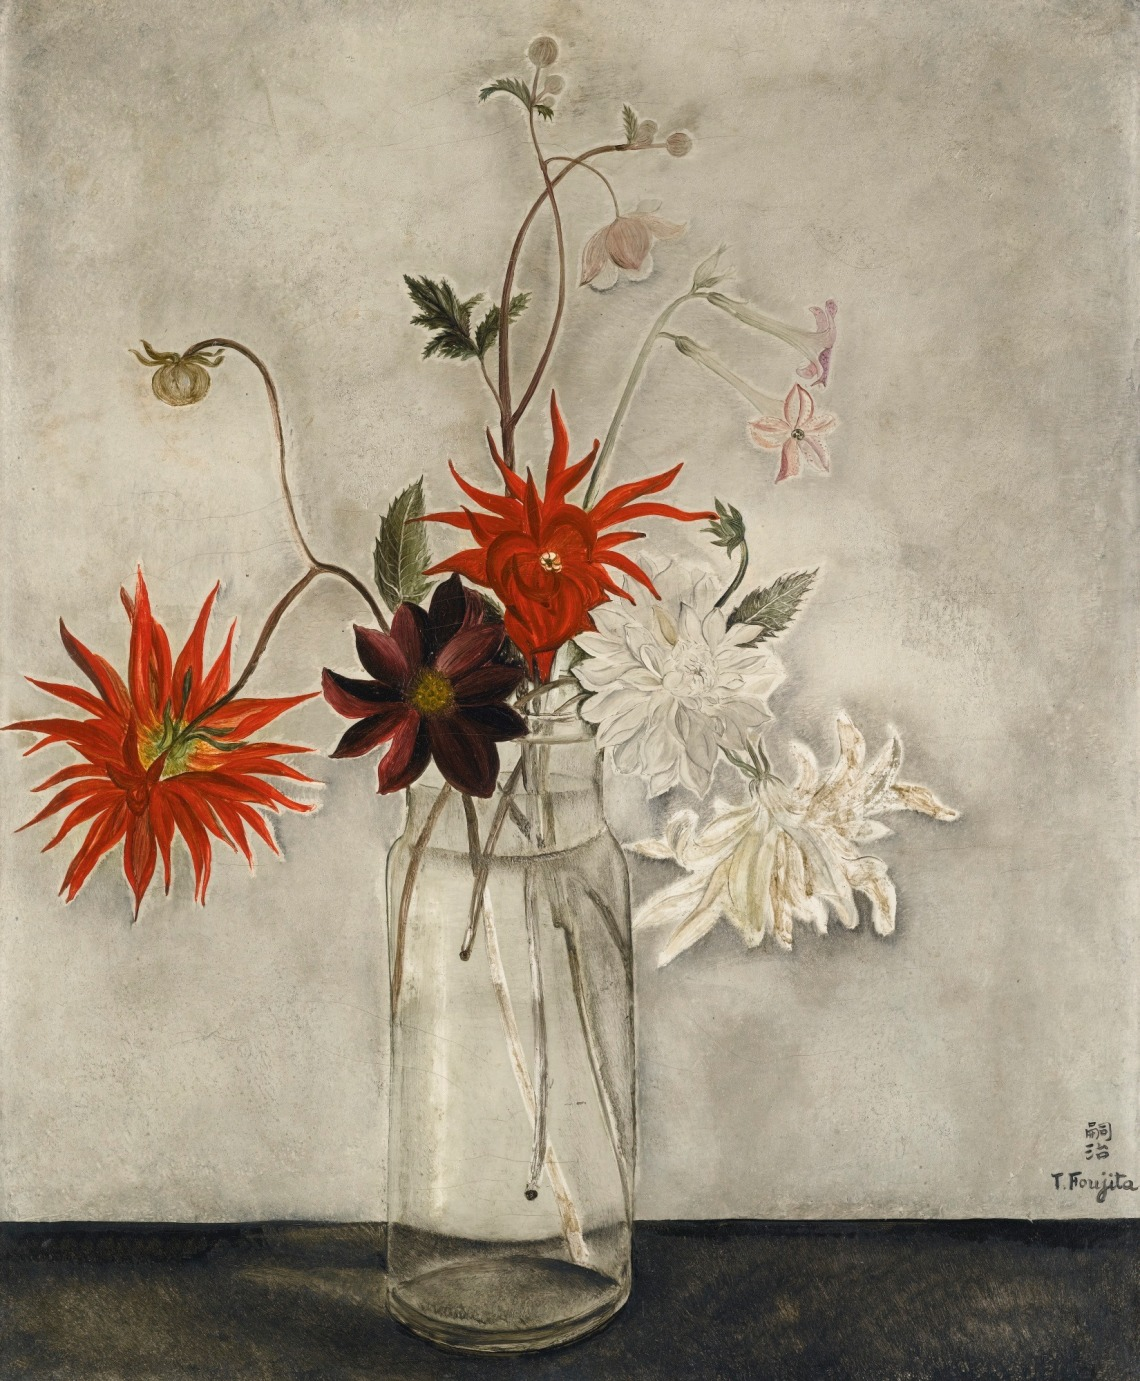 Leonard Tsuguharu Foujita (1886-1968) Les Dahlias 1921